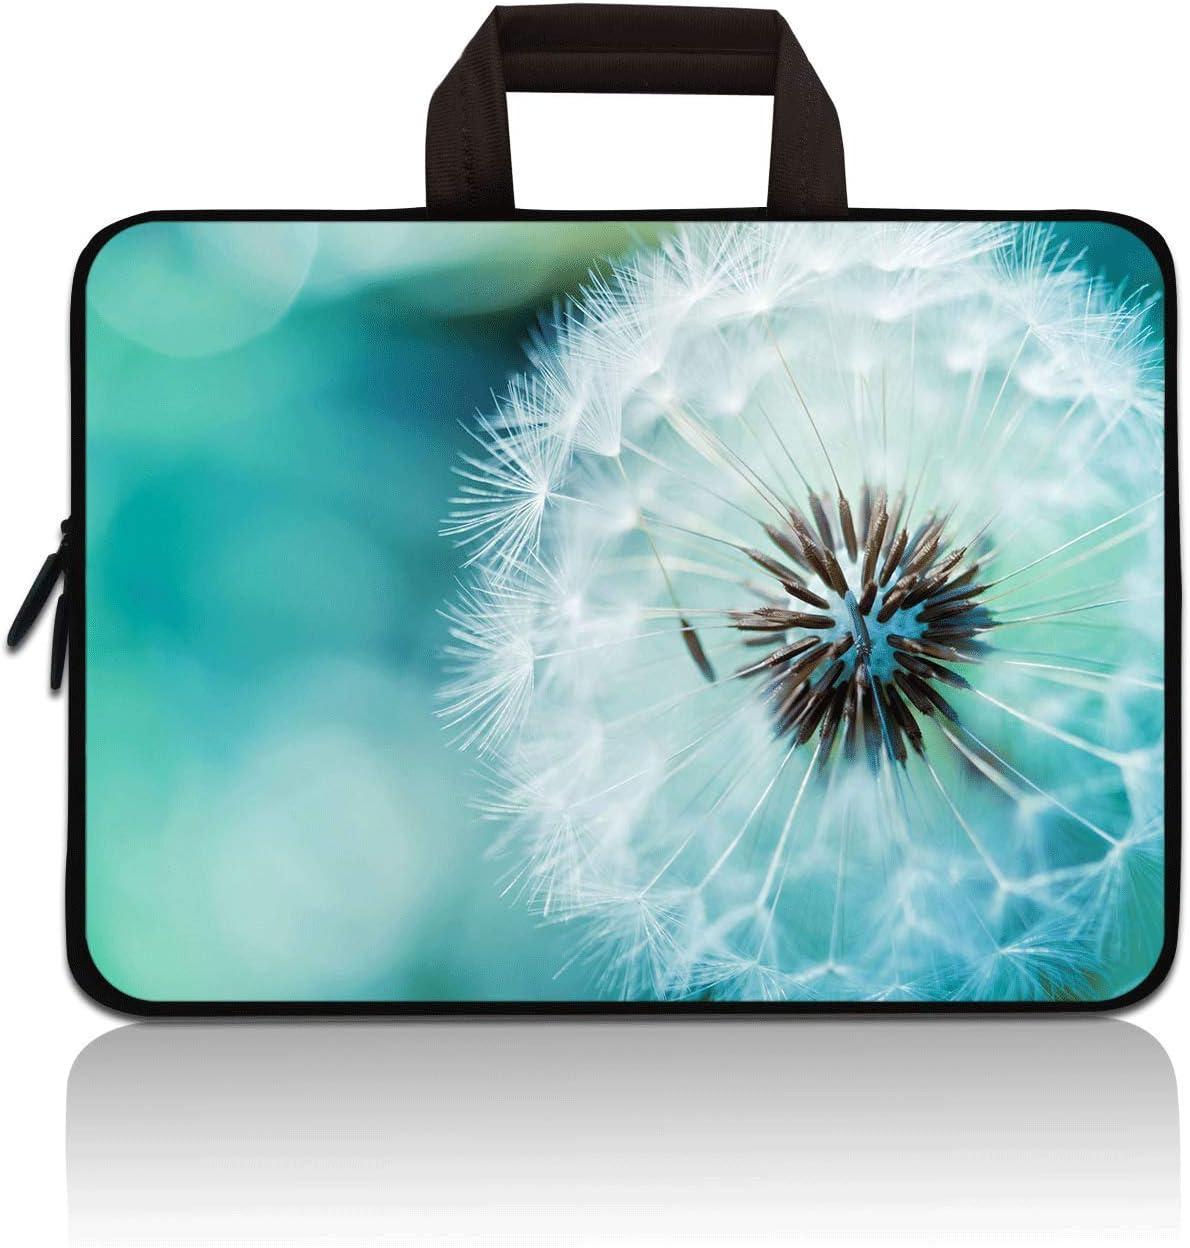 "11"" 11.6"" 12"" 12.1"" 12.5"" inch Laptop Carrying Bag Chromebook Case Notebook Ultrabook Bag Tablet Cover Neoprene Sleeve Fit Apple MacBook Air Samsung Google Acer HP DELL Lenovo Asus(Dandelion)"